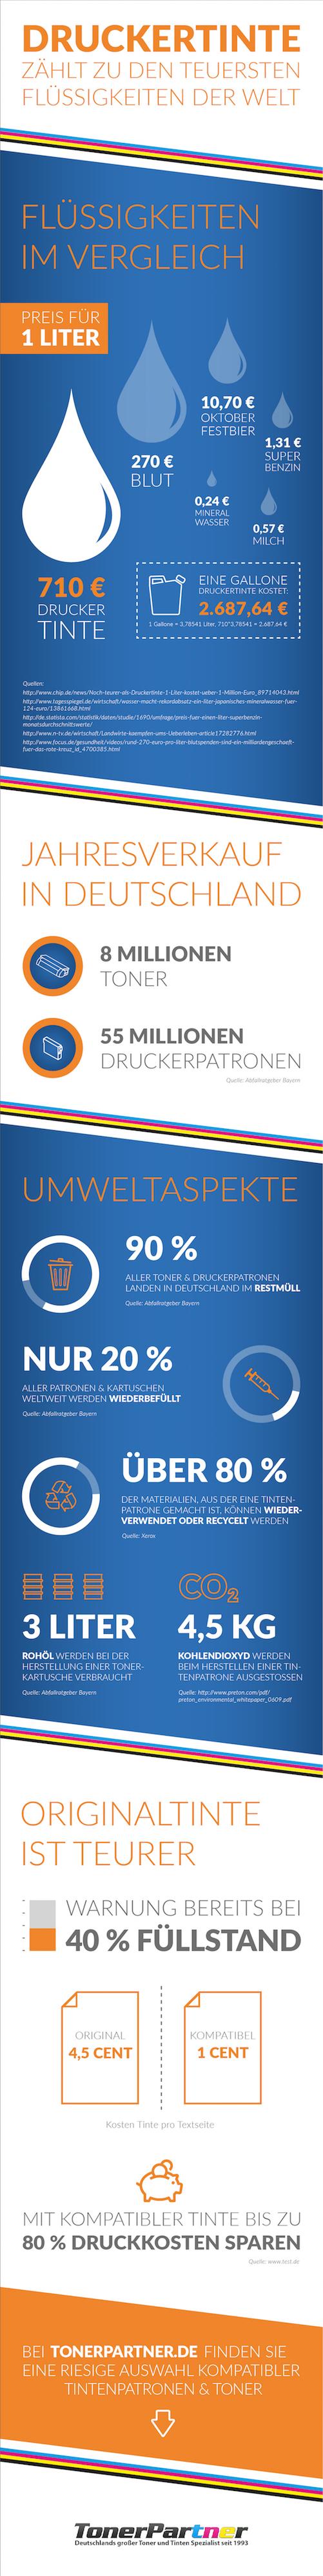 tonerpartner infografik druckkosten